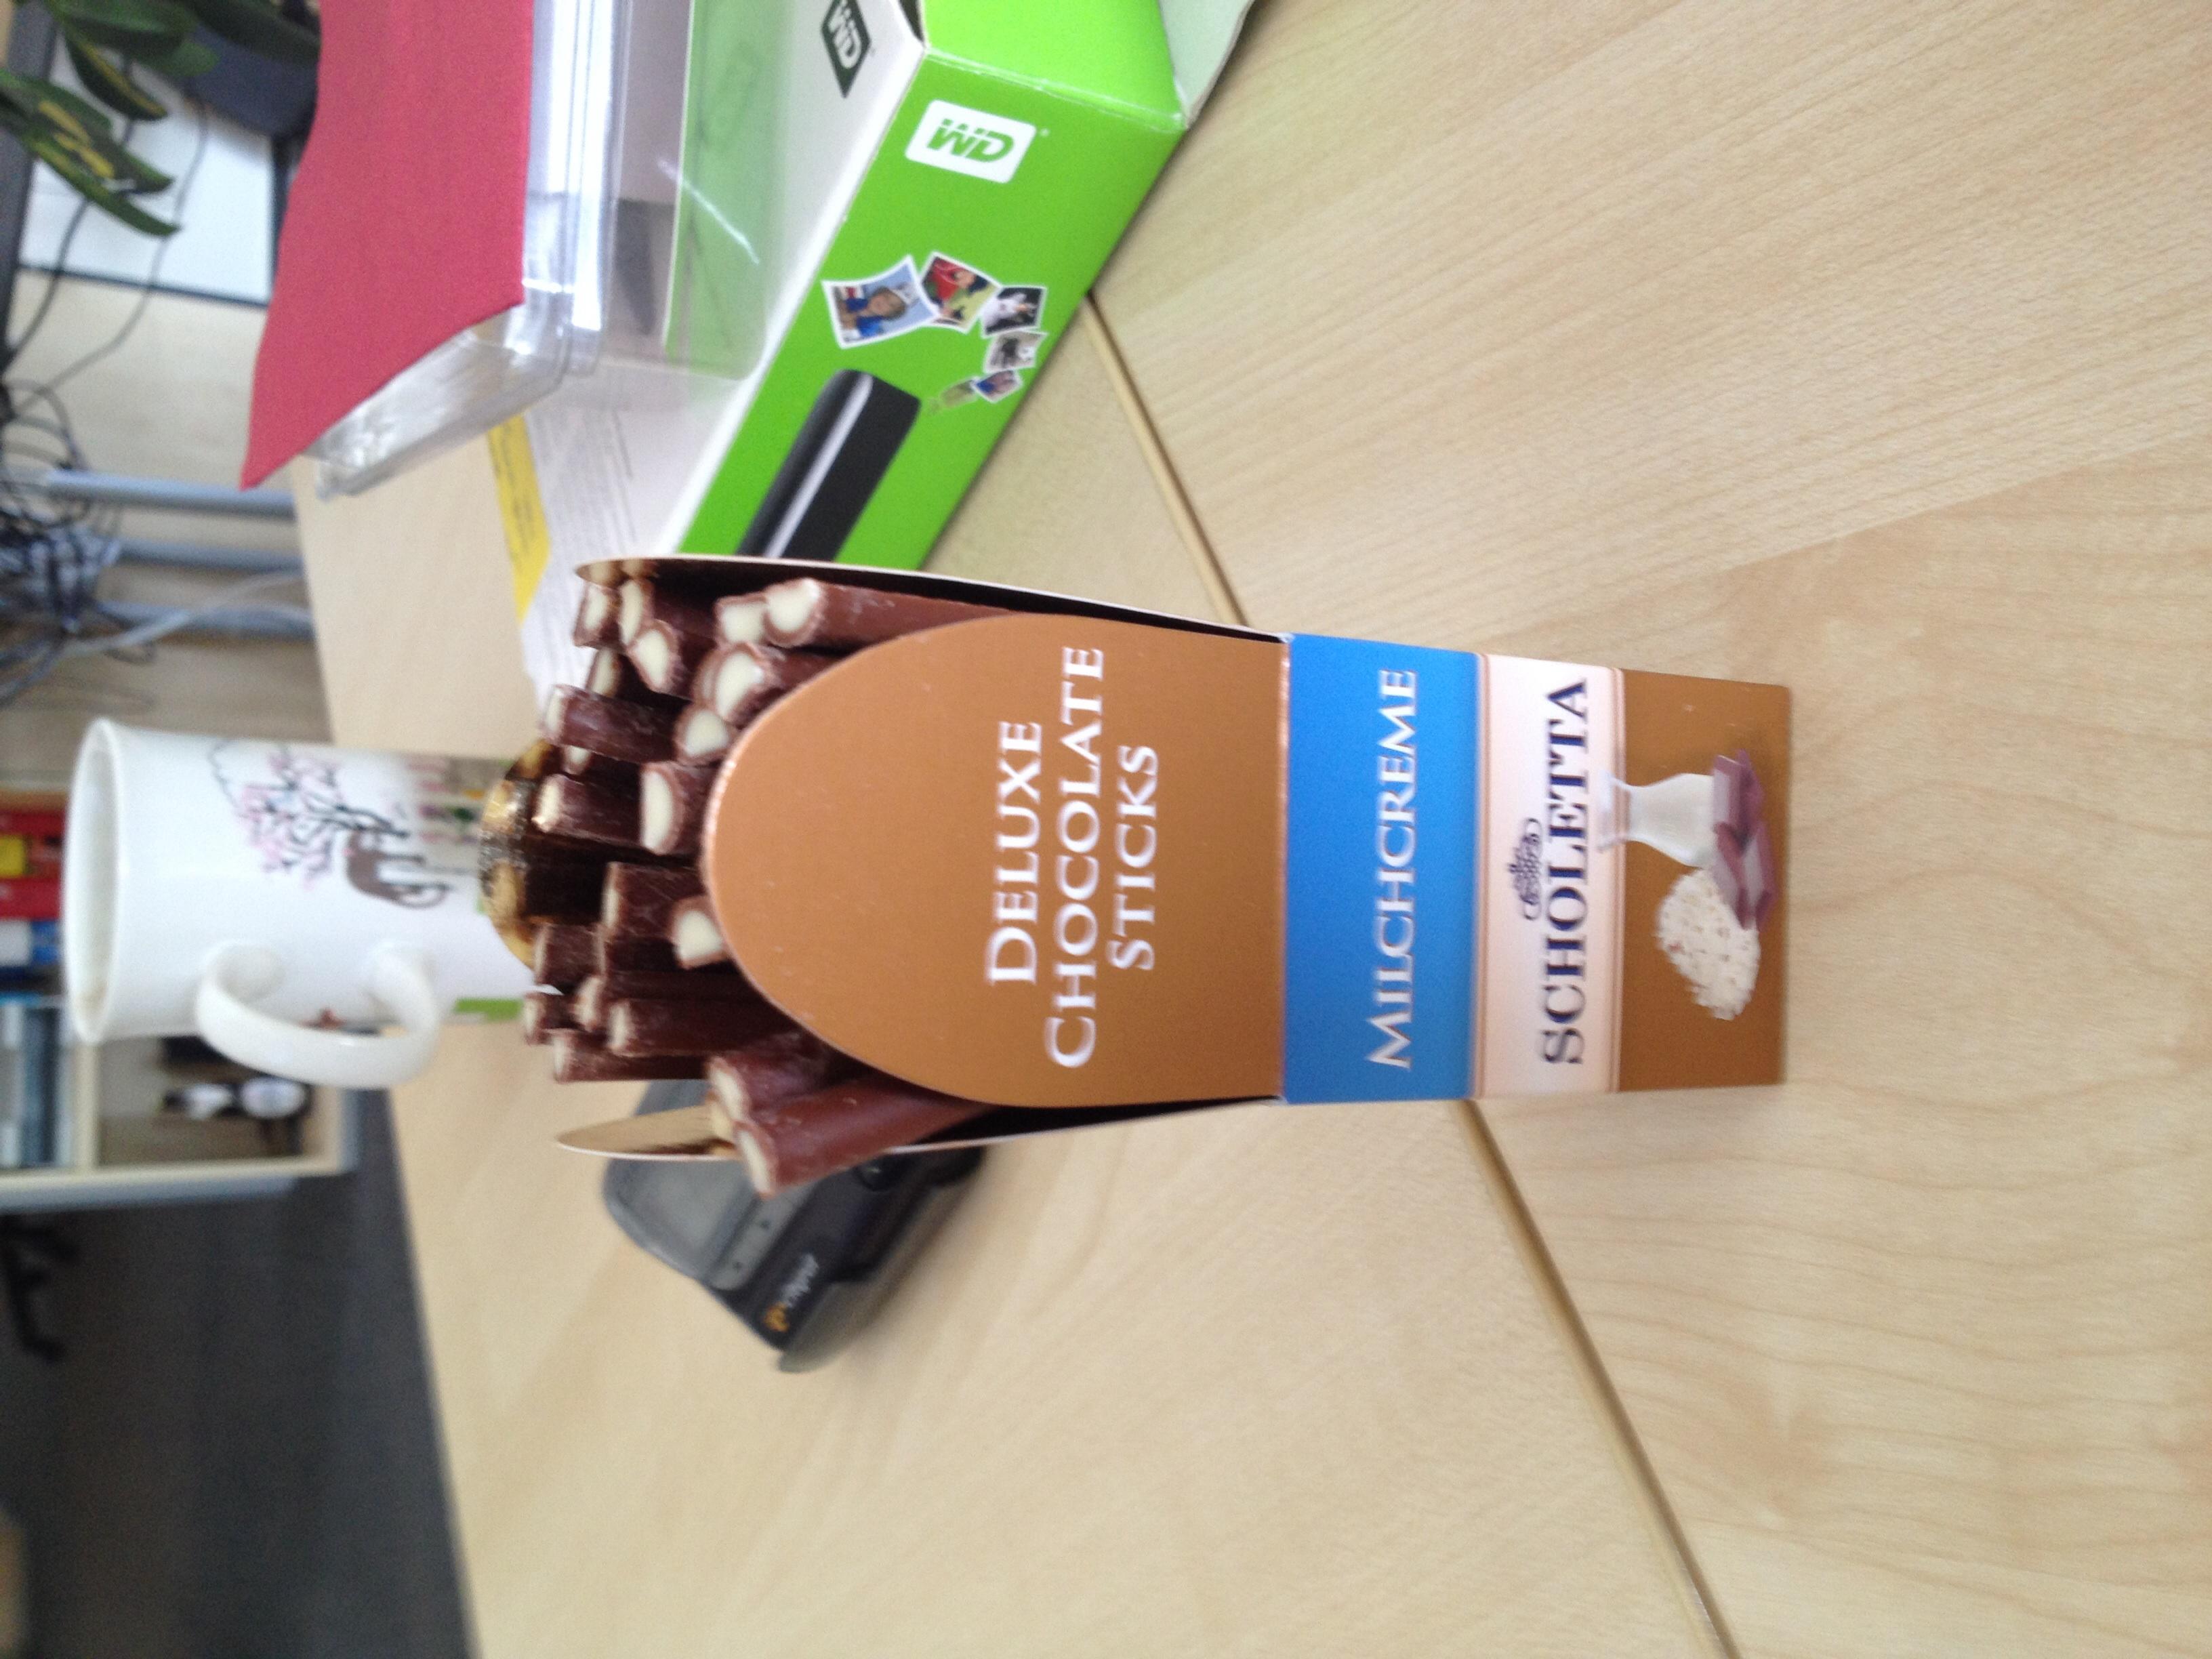 https://foodloader.net/BrollyLSSJ_2014-08-21_Deluxe_Chocolate_Sticks.jpg